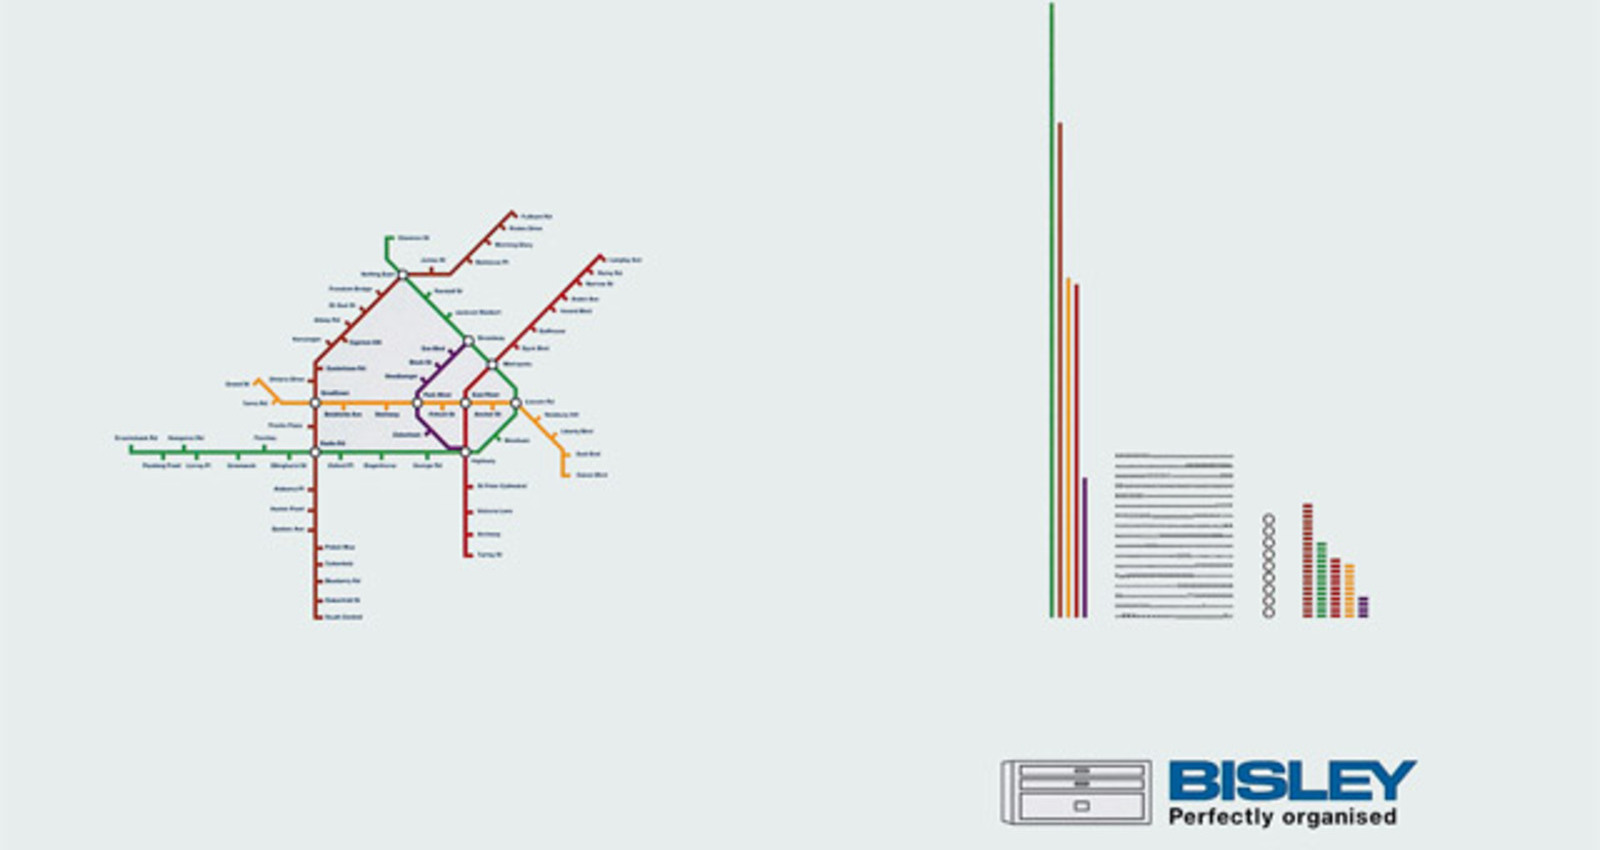 Music, Subway, Bar code, Digital Watch